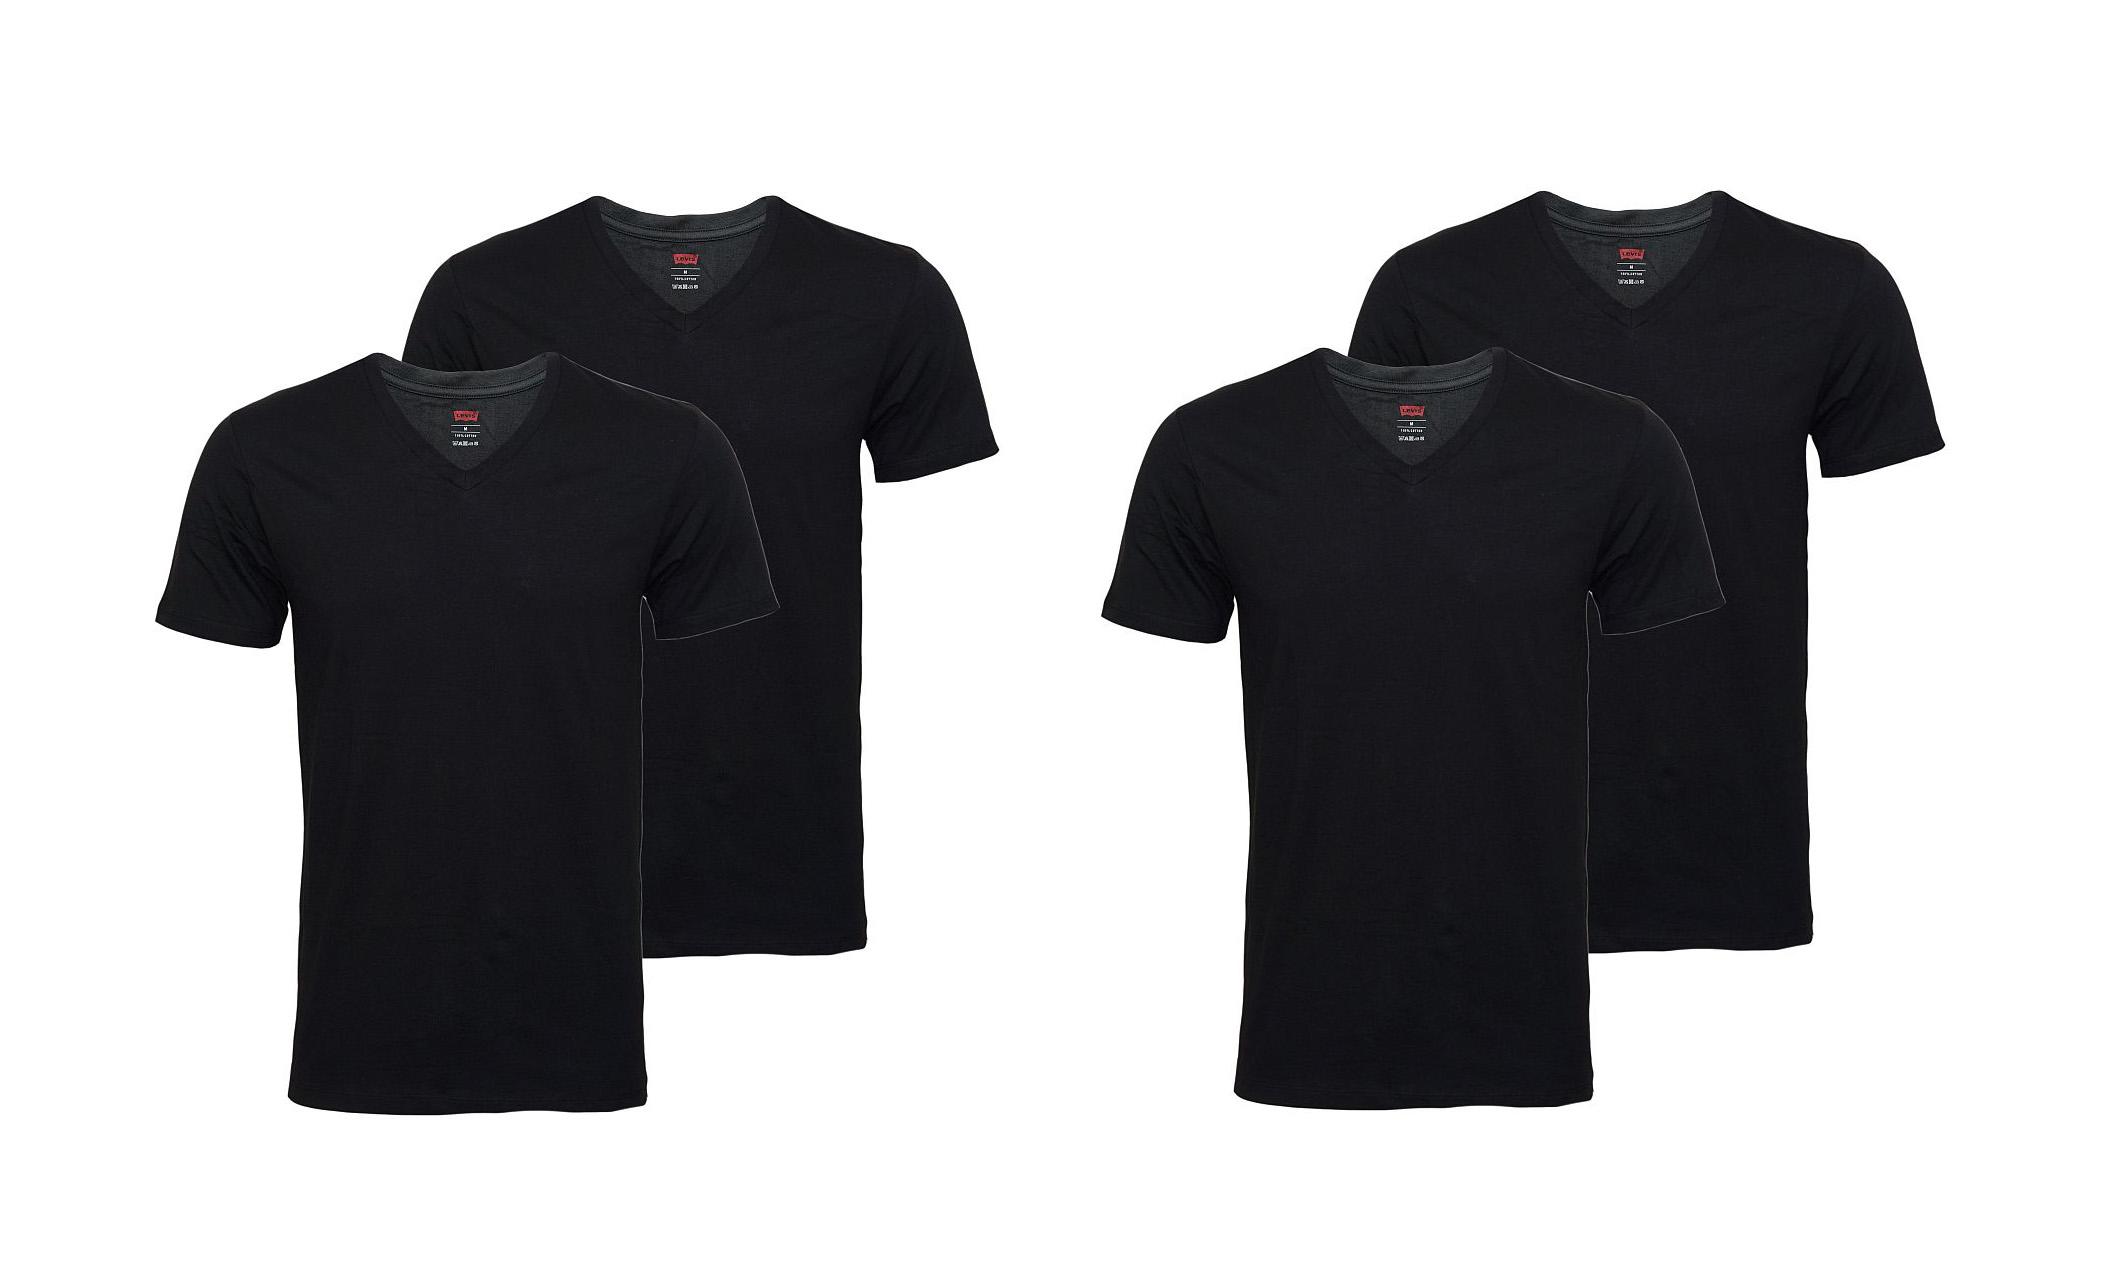 LEVIS Shirts 200SF 2 x 2er Pack T-Shirt 945004001 884 Jet Black SF17-LVSS2